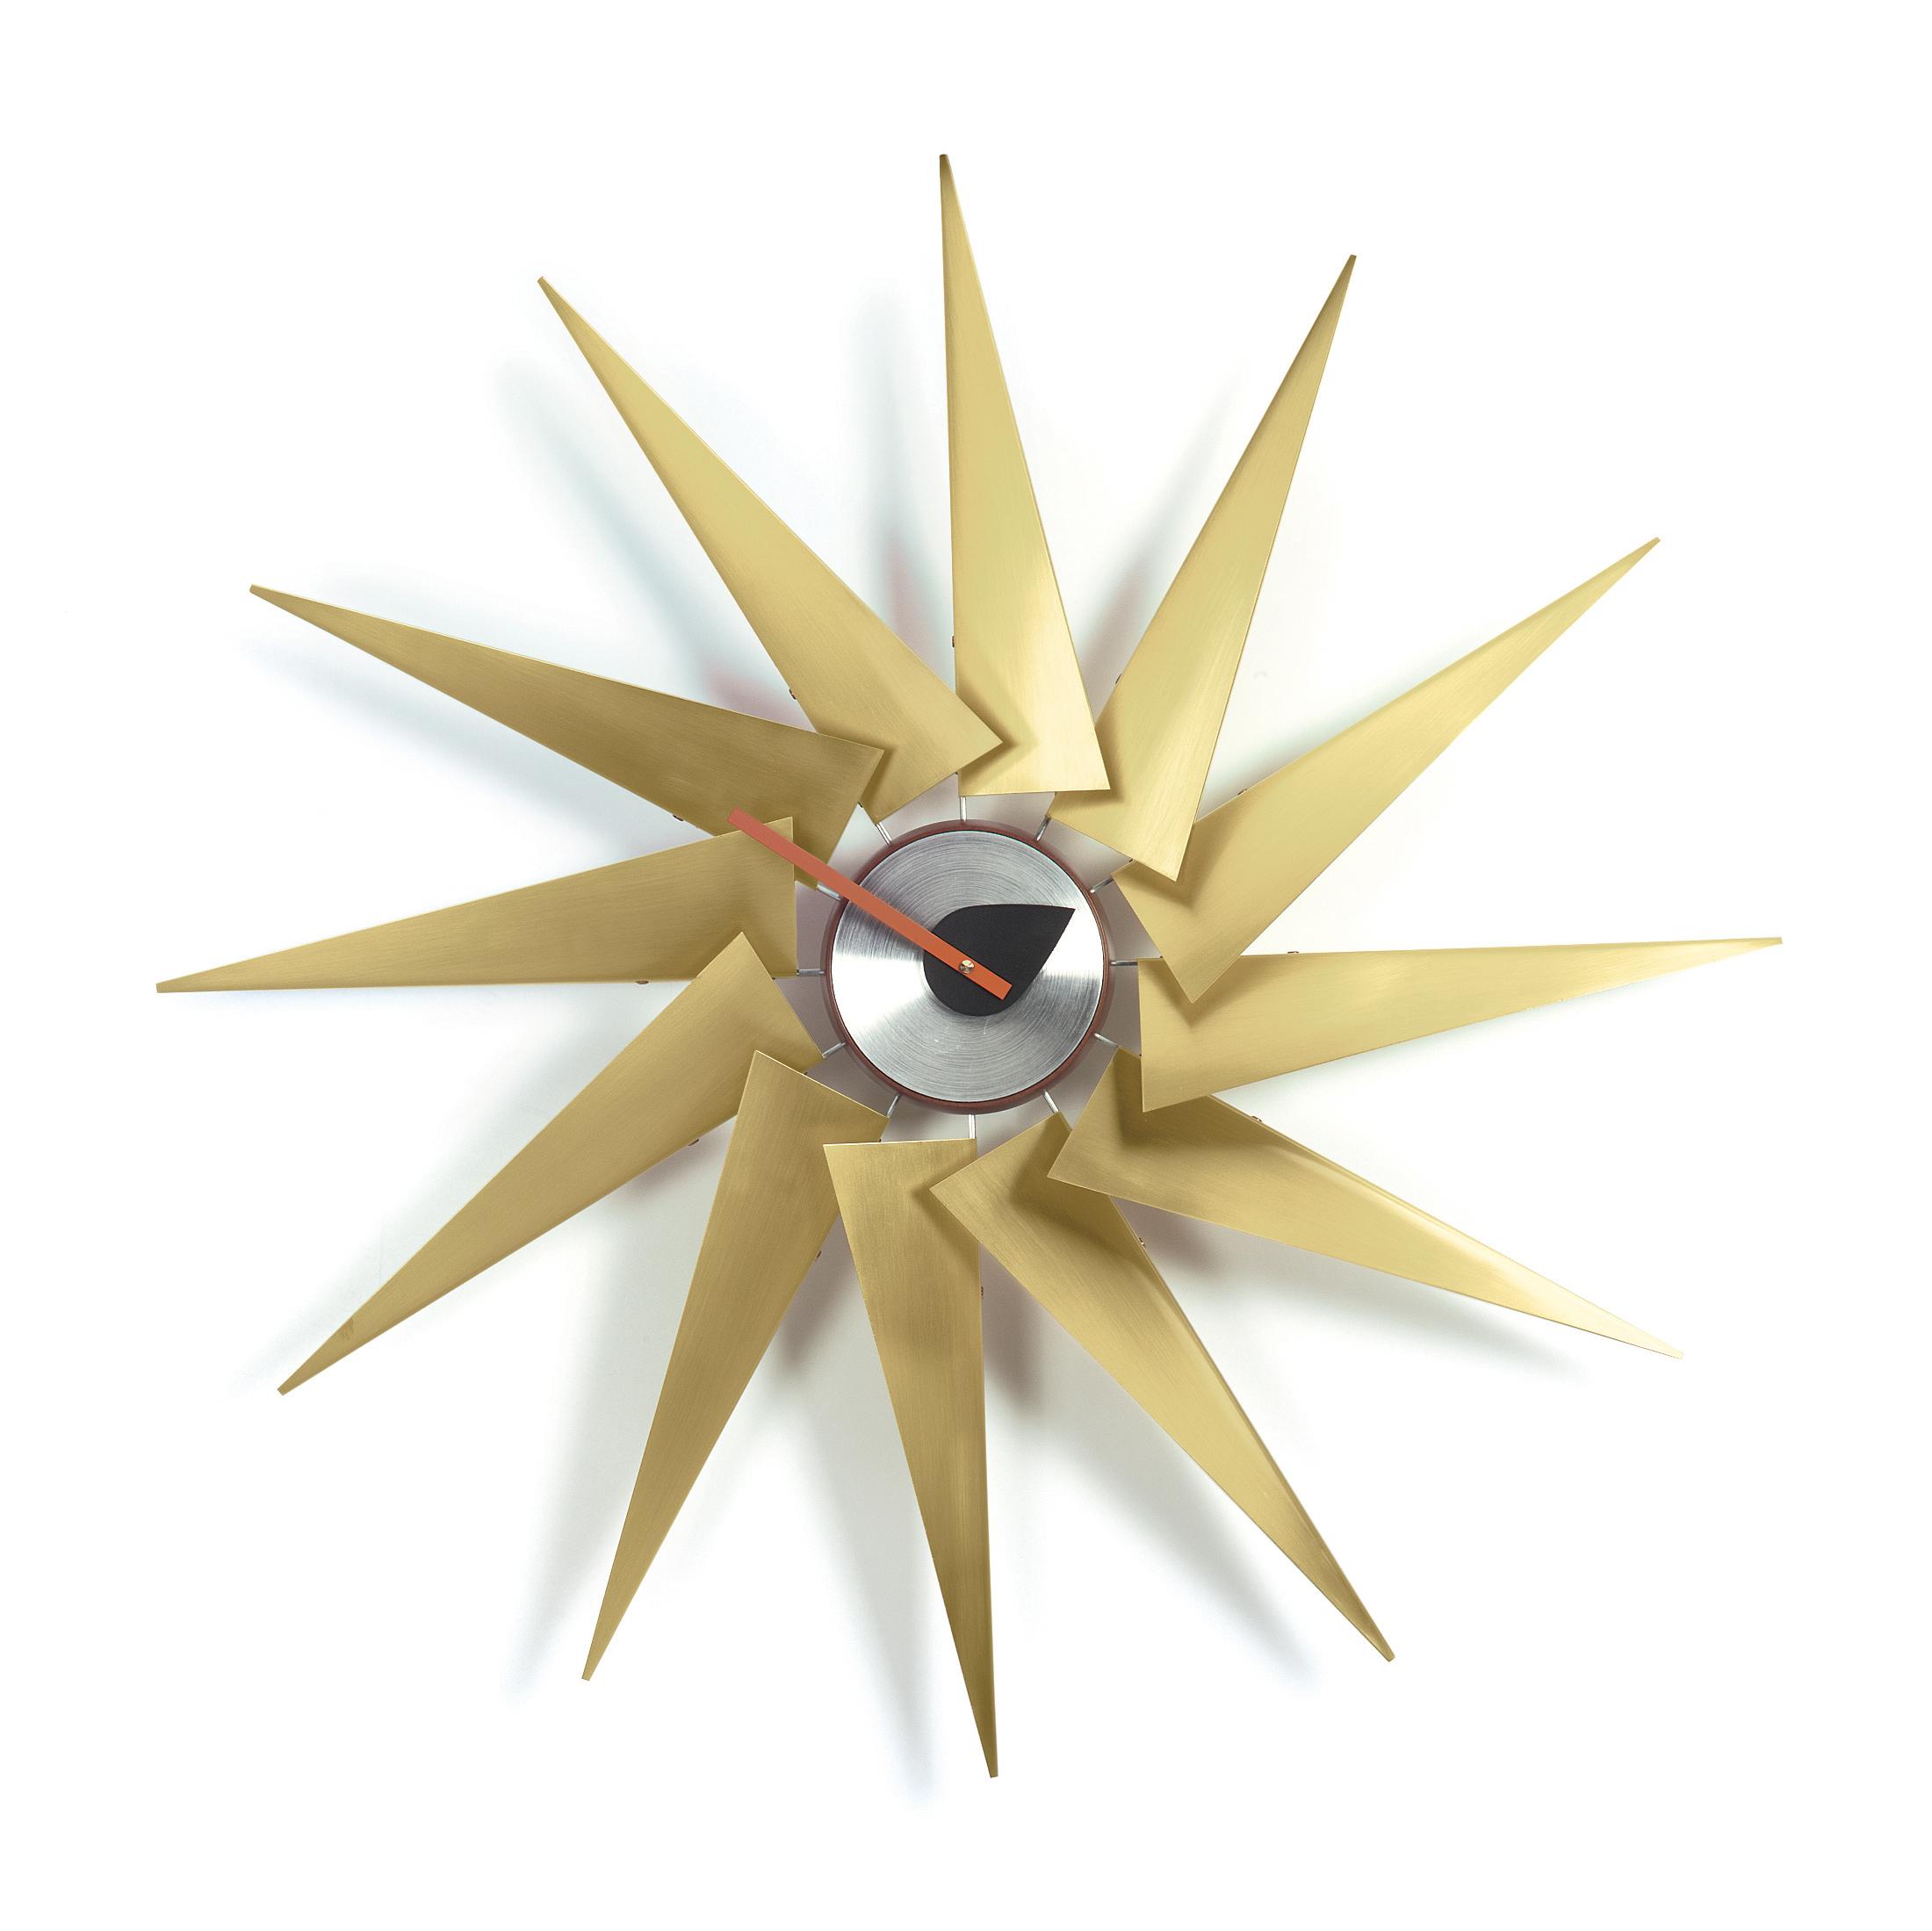 Name : Turbine Clock